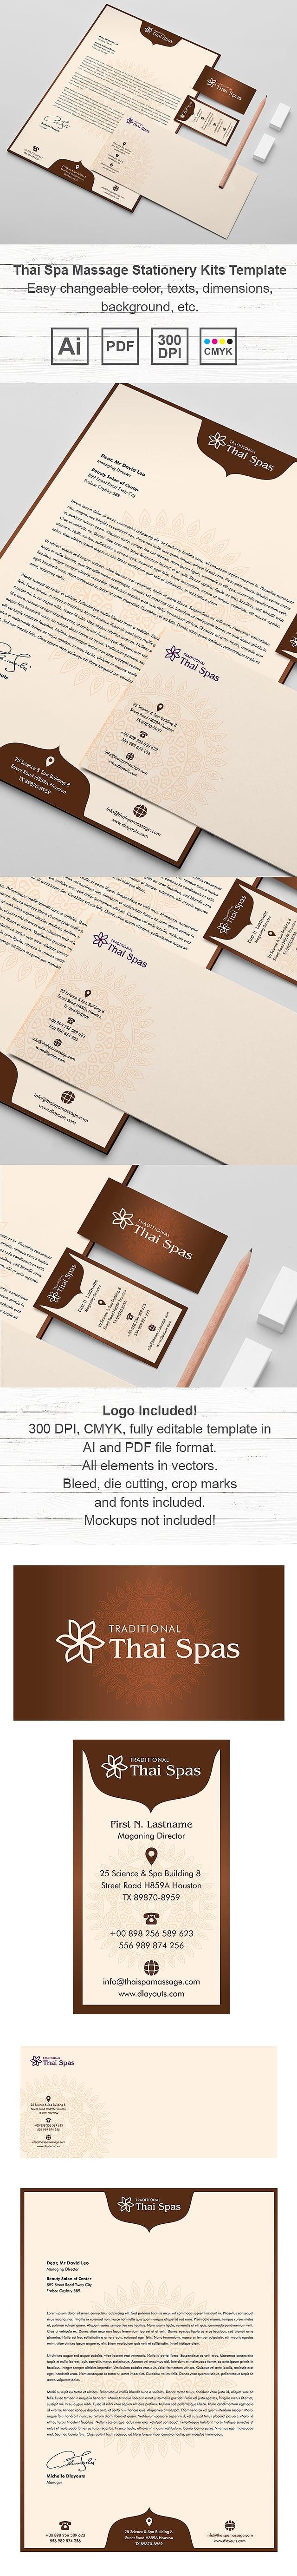 Thai Spa Massage Stationery Kits Template